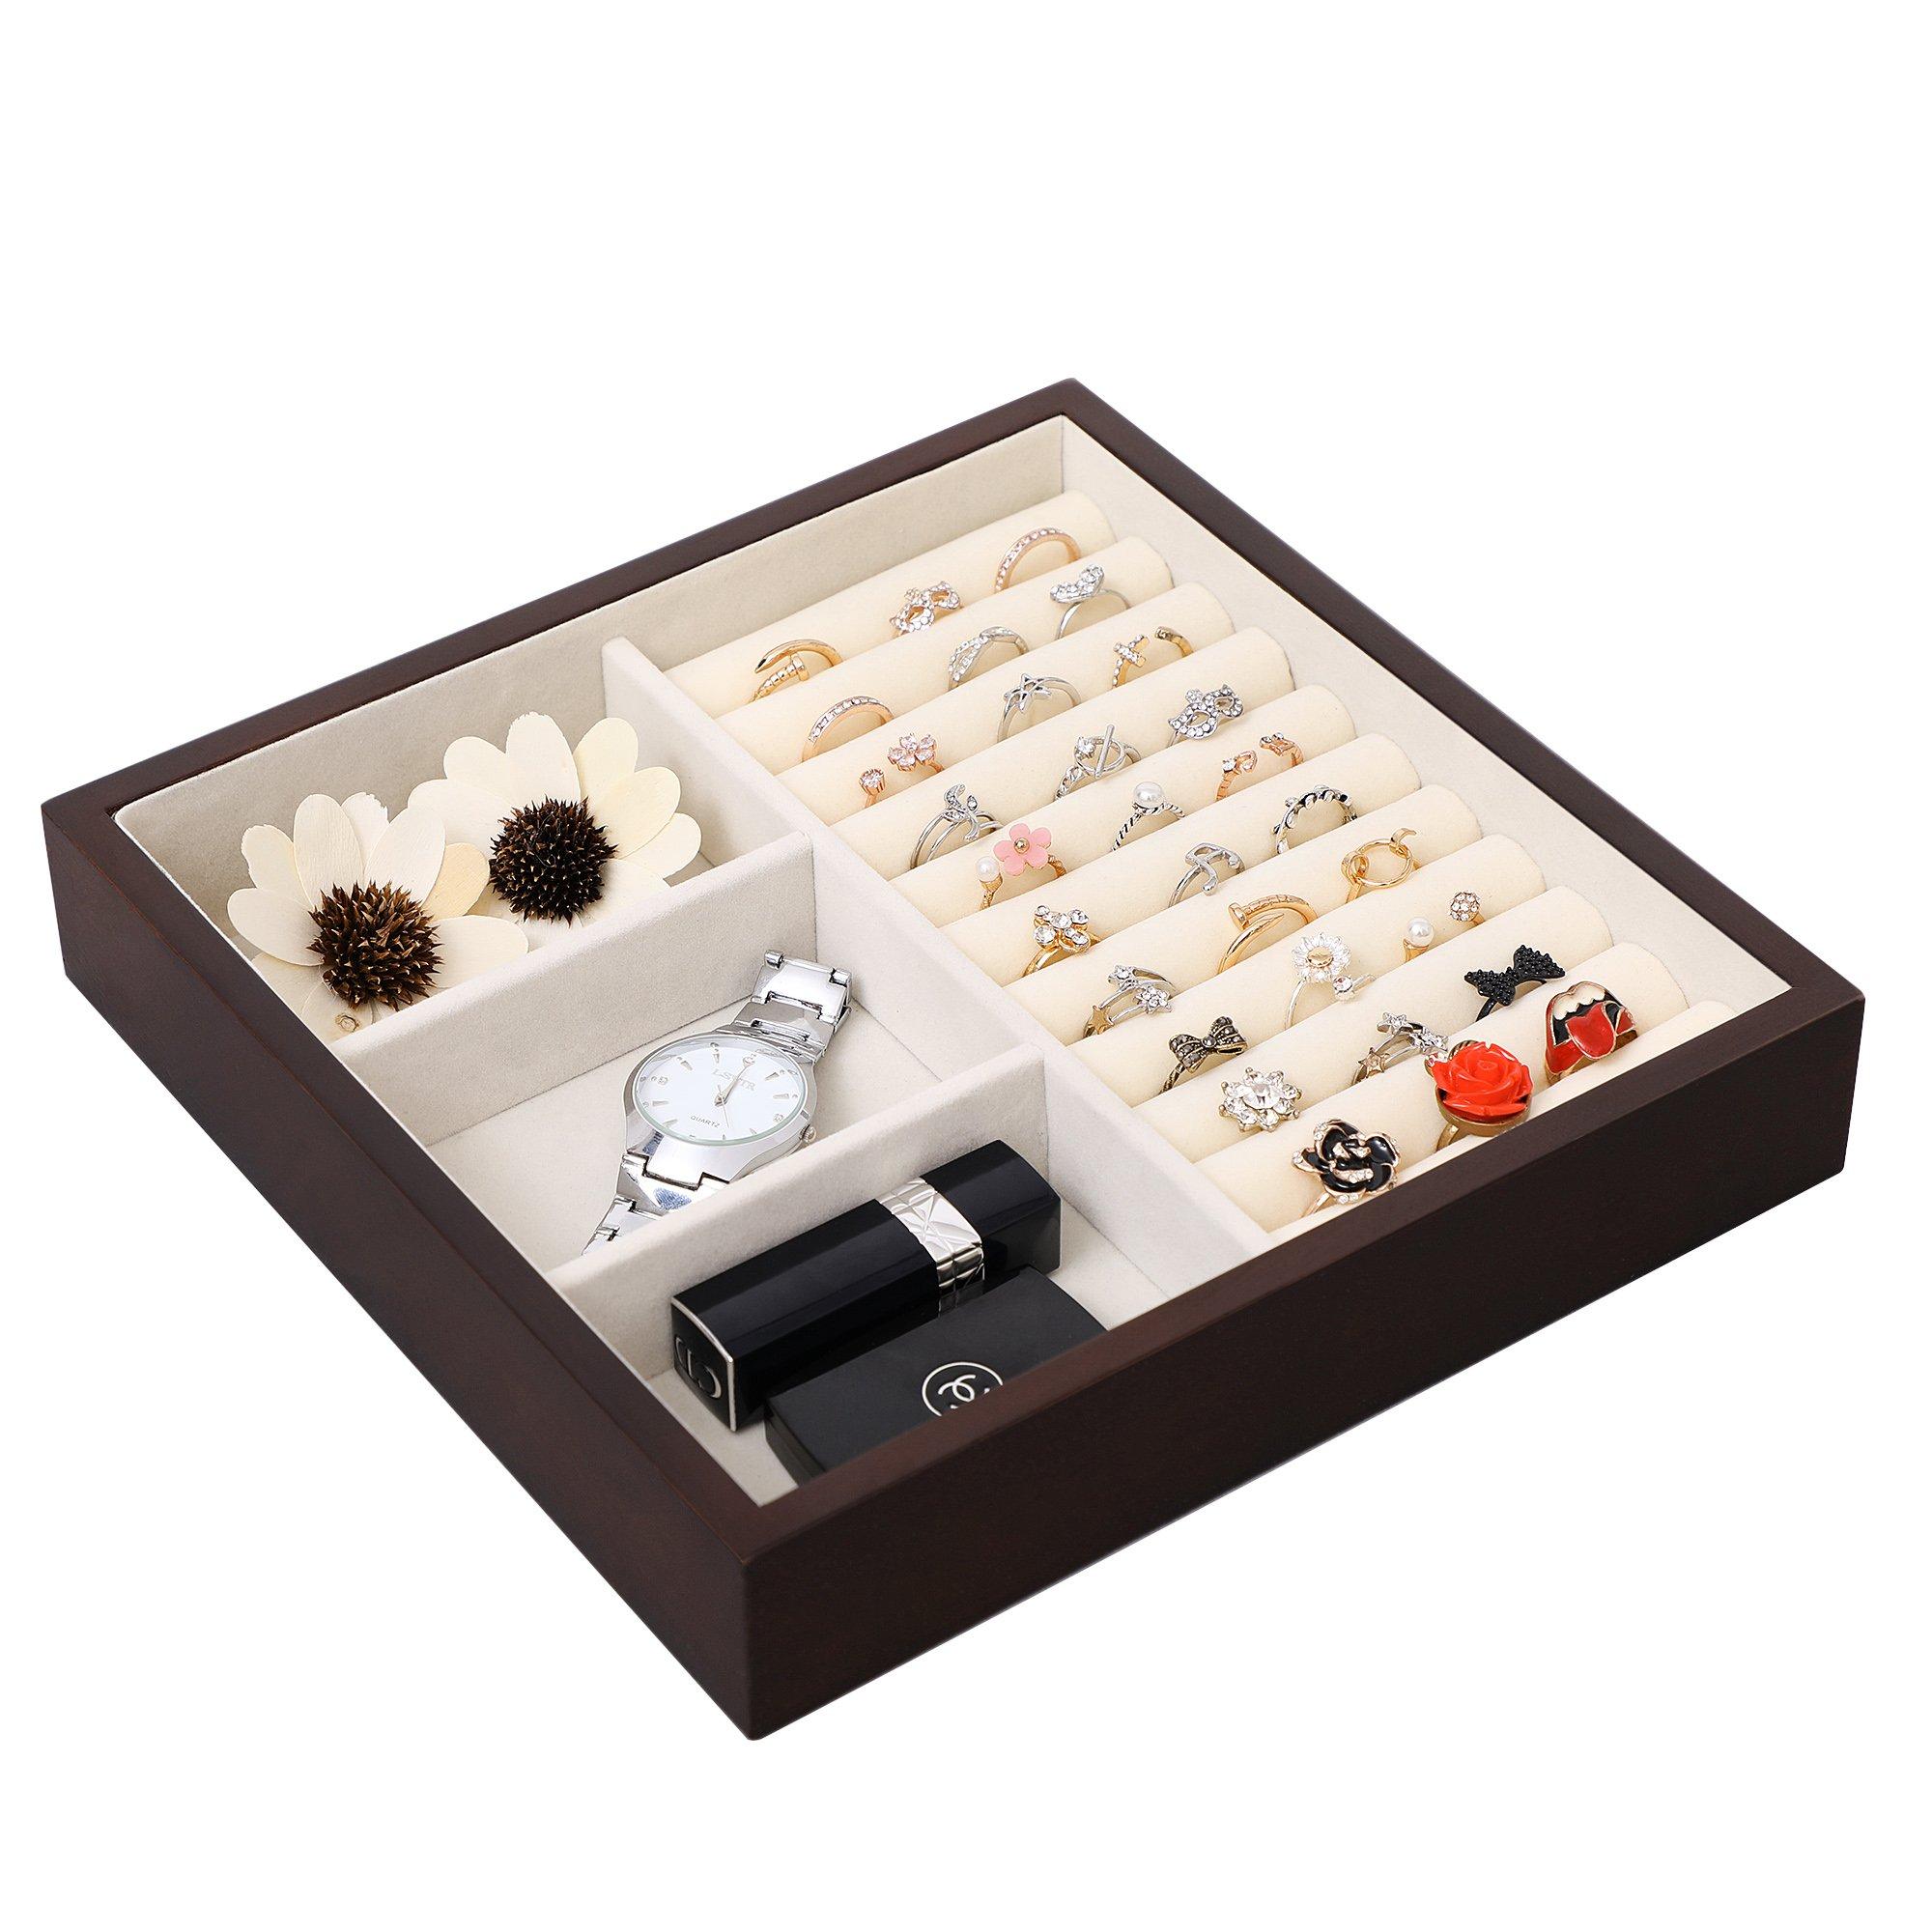 SONGMICS Large Jewelry Armoire Cabinet Standing Storage Chest Neckalce Organizer Dark Walnut UJJC14K by SONGMICS (Image #9)